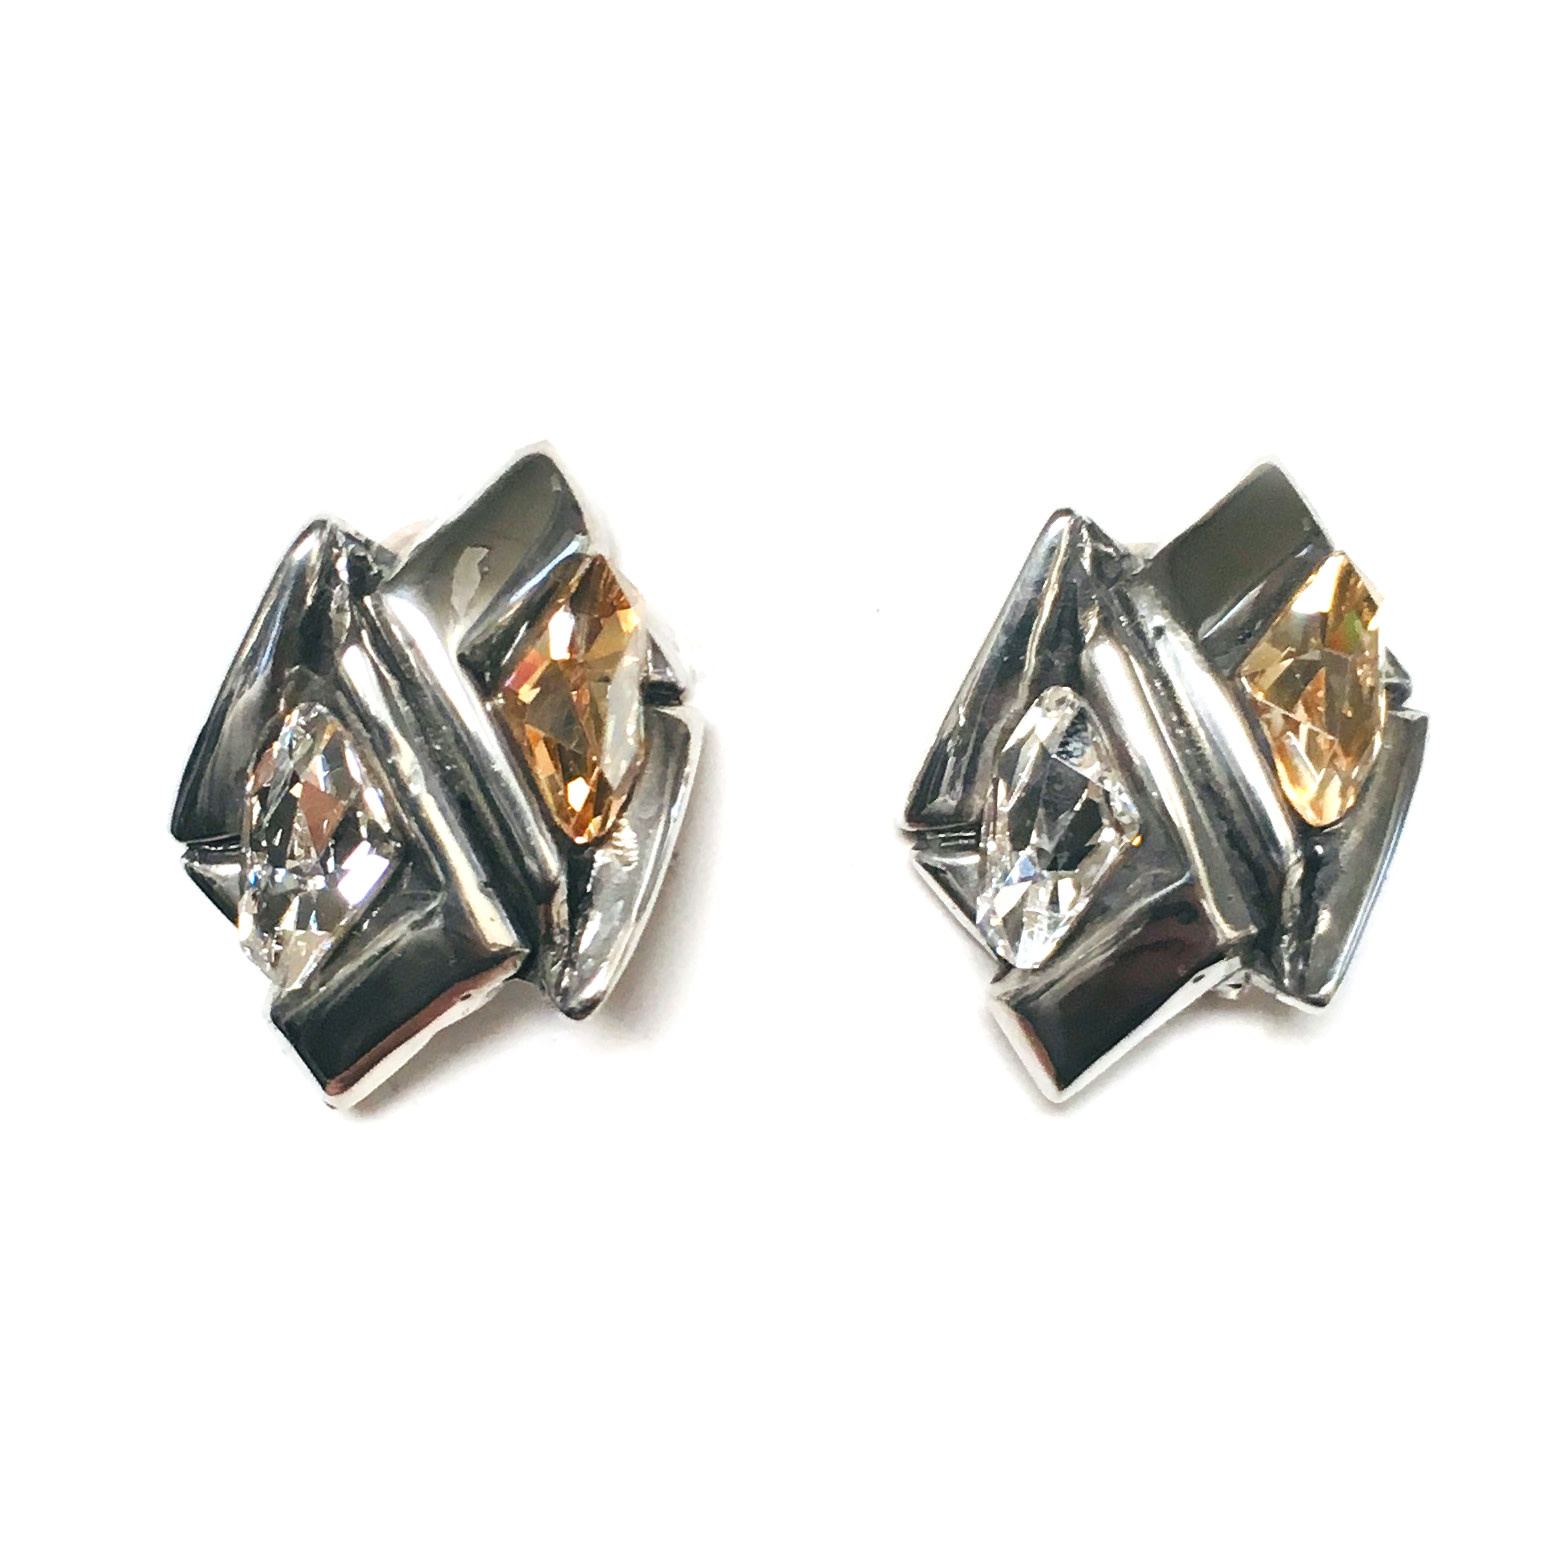 Fahrenheit Fahrenheit Zig-zag Earrings